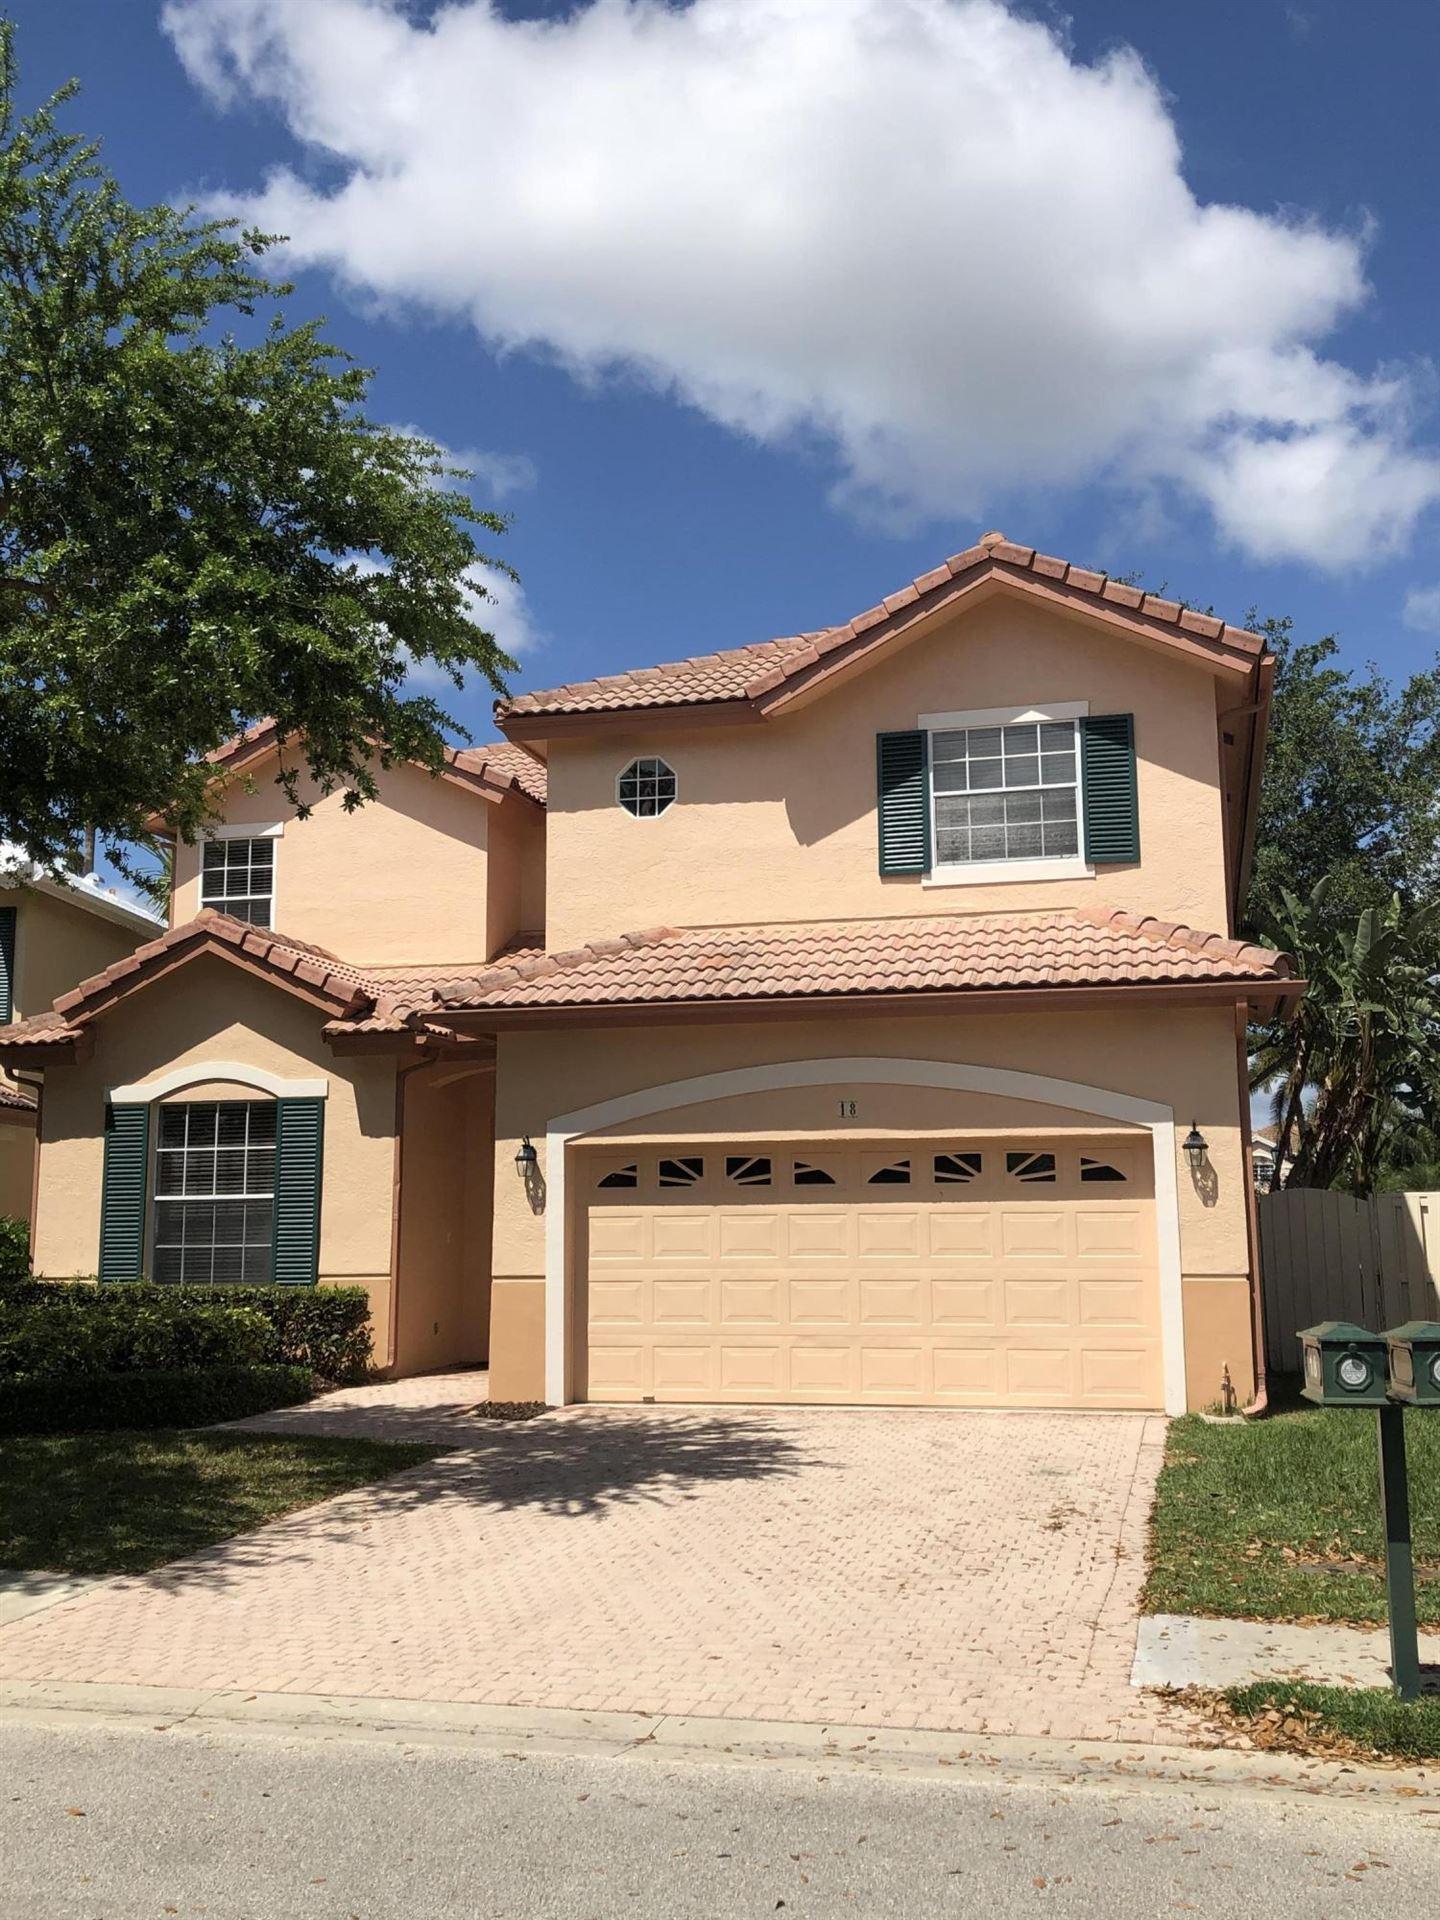 Photo of 18 Porta Vista Circle, Palm Beach Gardens, FL 33418 (MLS # RX-10609614)